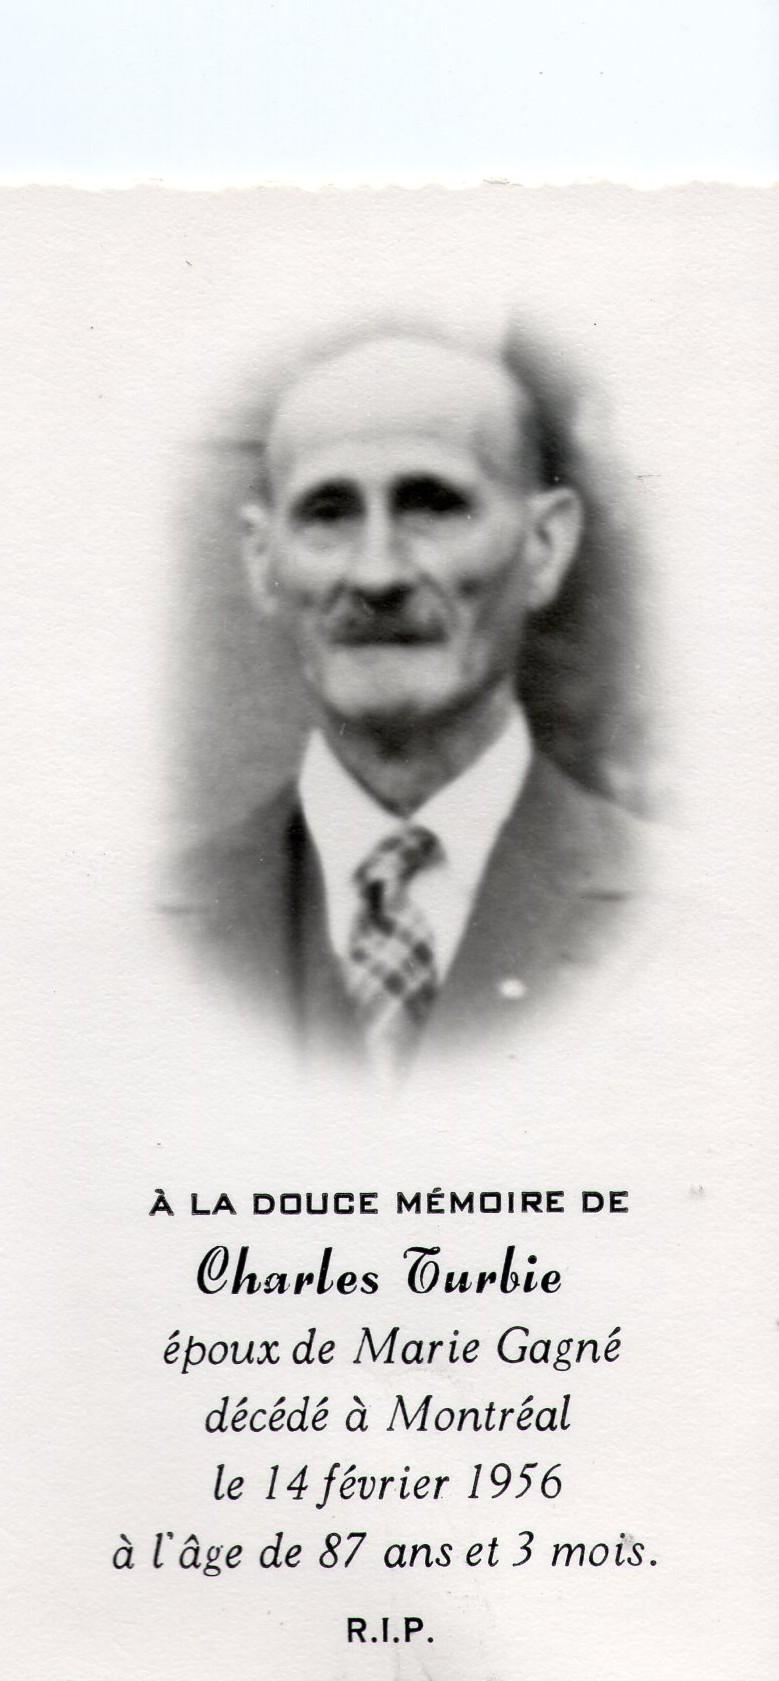 Charles Turbis 1869-1956